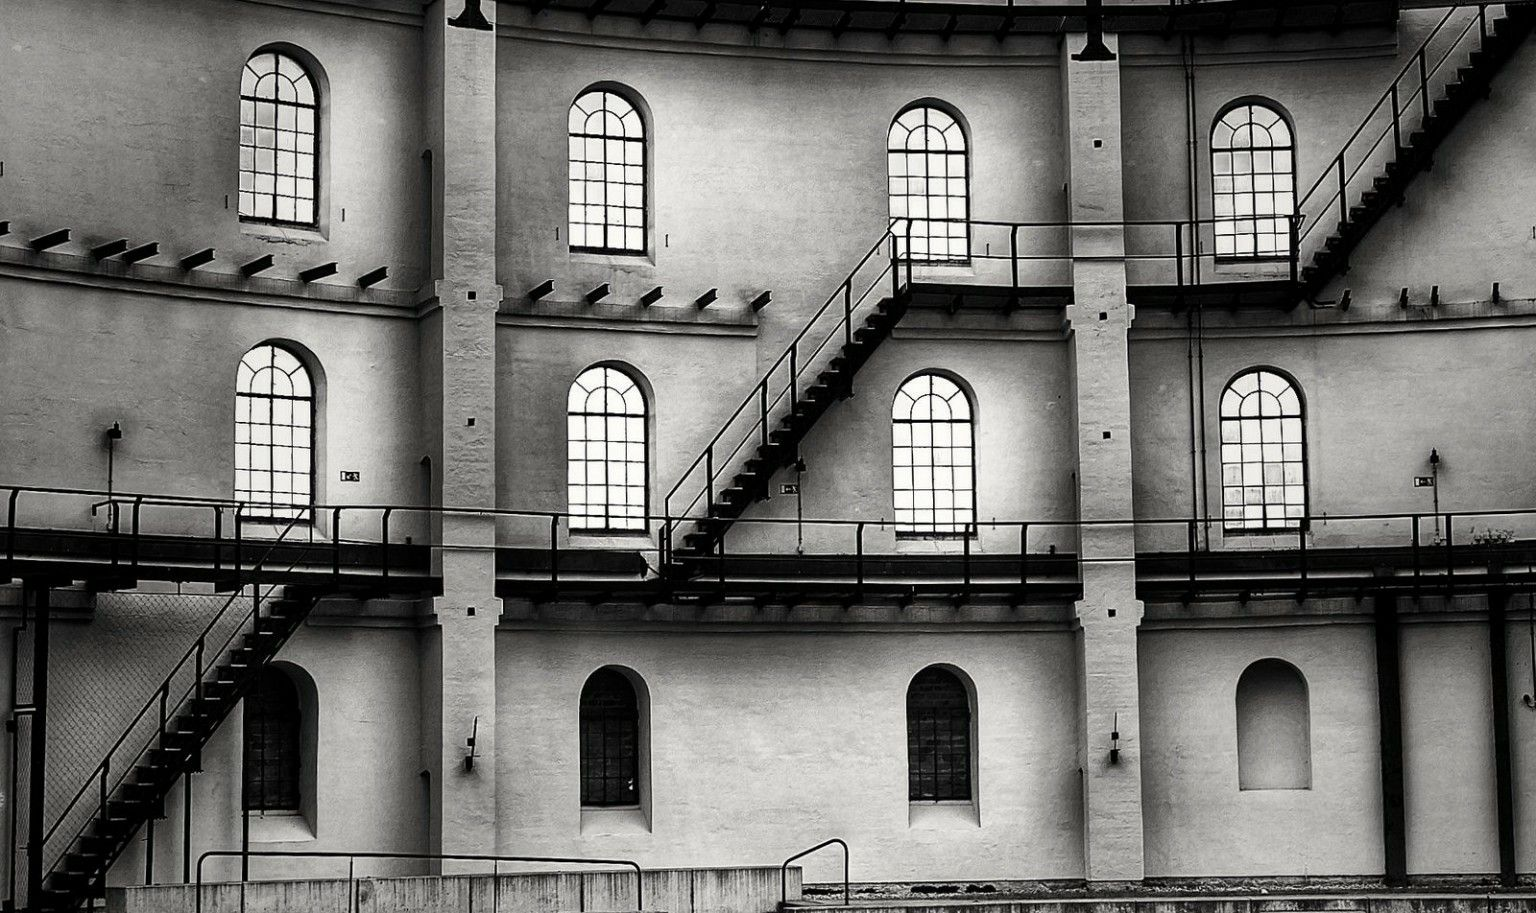 Leipzig Fotografie leipzig panometer black white photography sw fotografie pepe ro